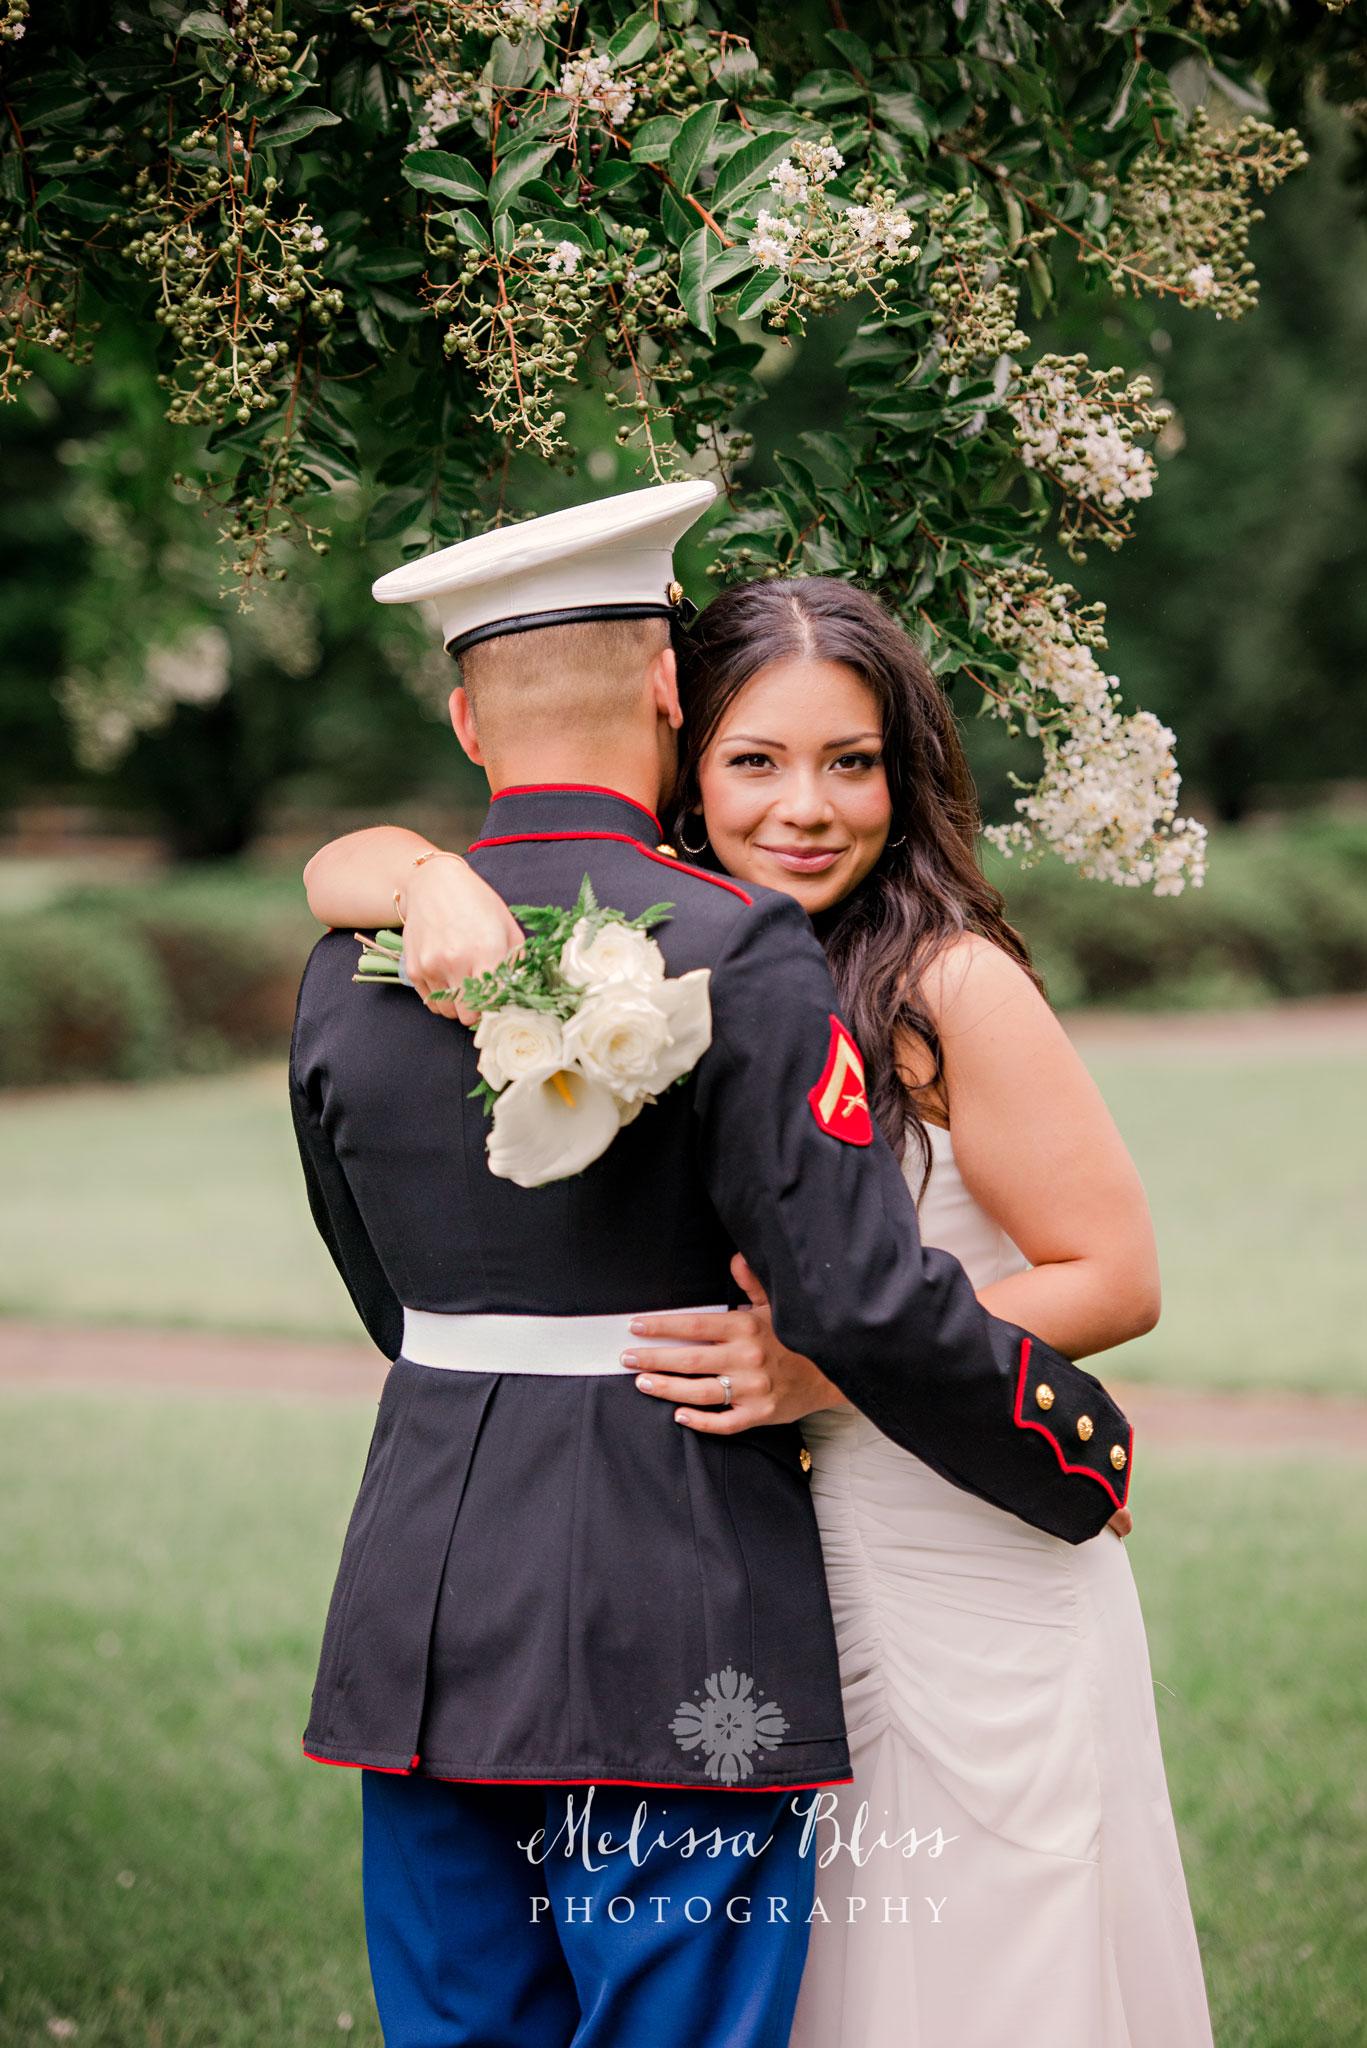 virginia-beach-wedding-photographers-melissa-bliss-photography-elopement-session-sandbridge-norfolk-chesapeake-wedding-photographers.jpg